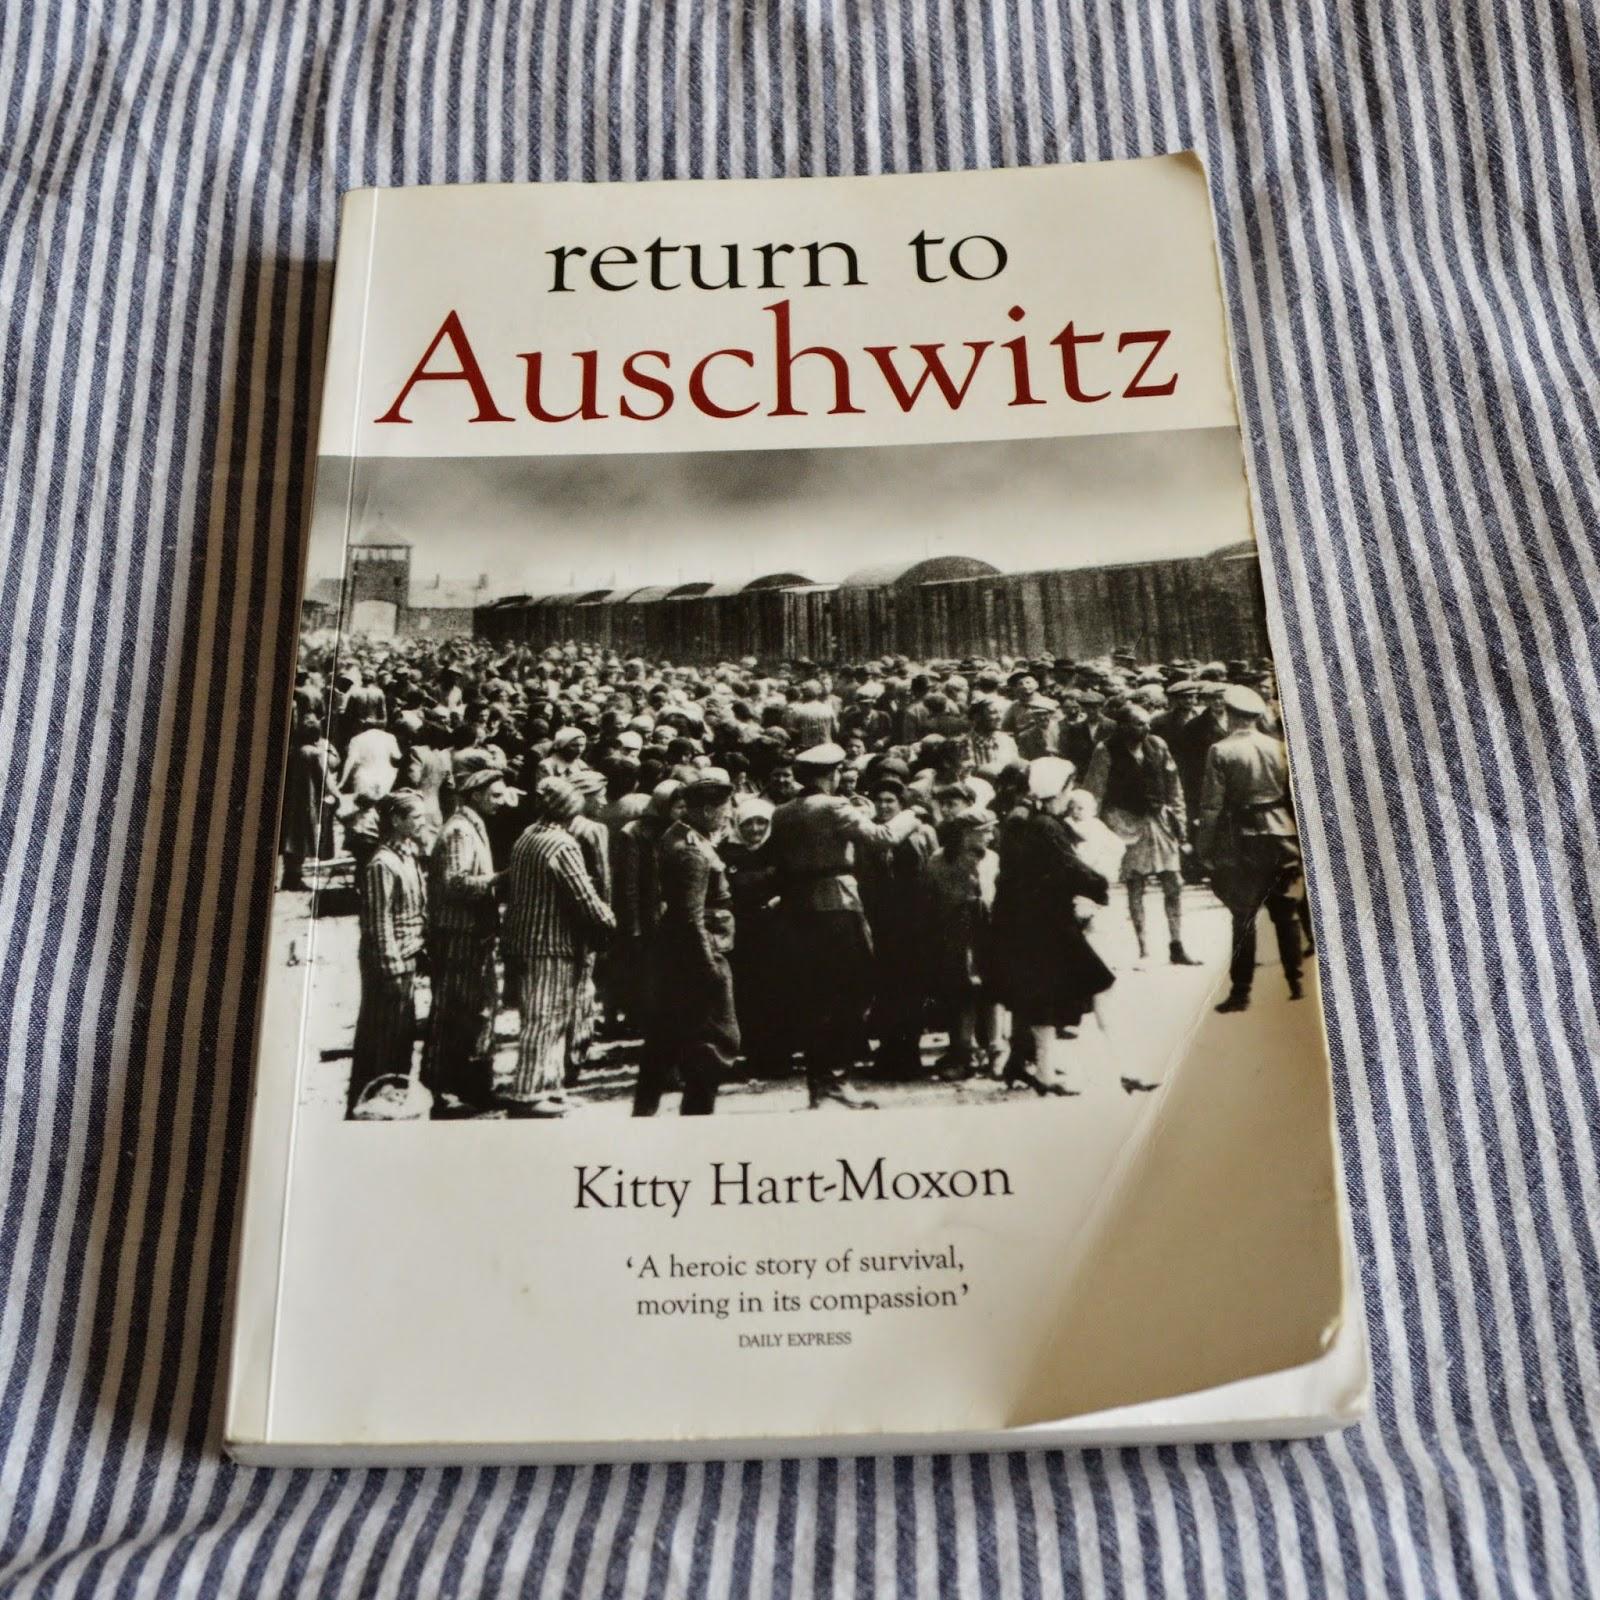 Return to Auschwitz, review, Kitty Hart-Moxon, autobiography, holocaust, survivor, paperback